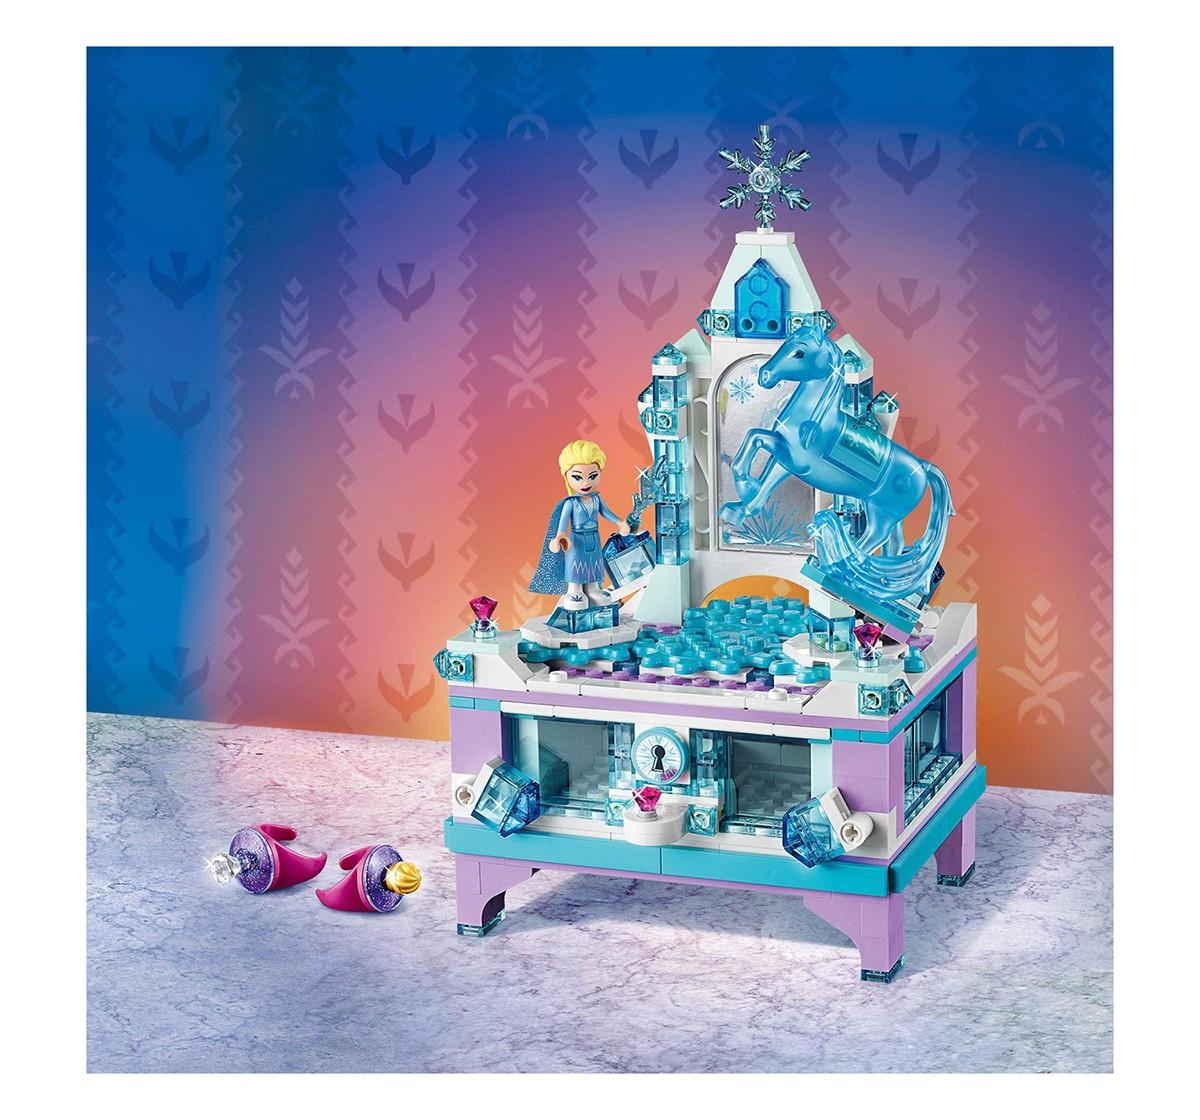 Lego Disney Frozen 2 Elsa's Jewelry Box Creation (300 Pcs) 41168  Blocks for Kids age 6Y+